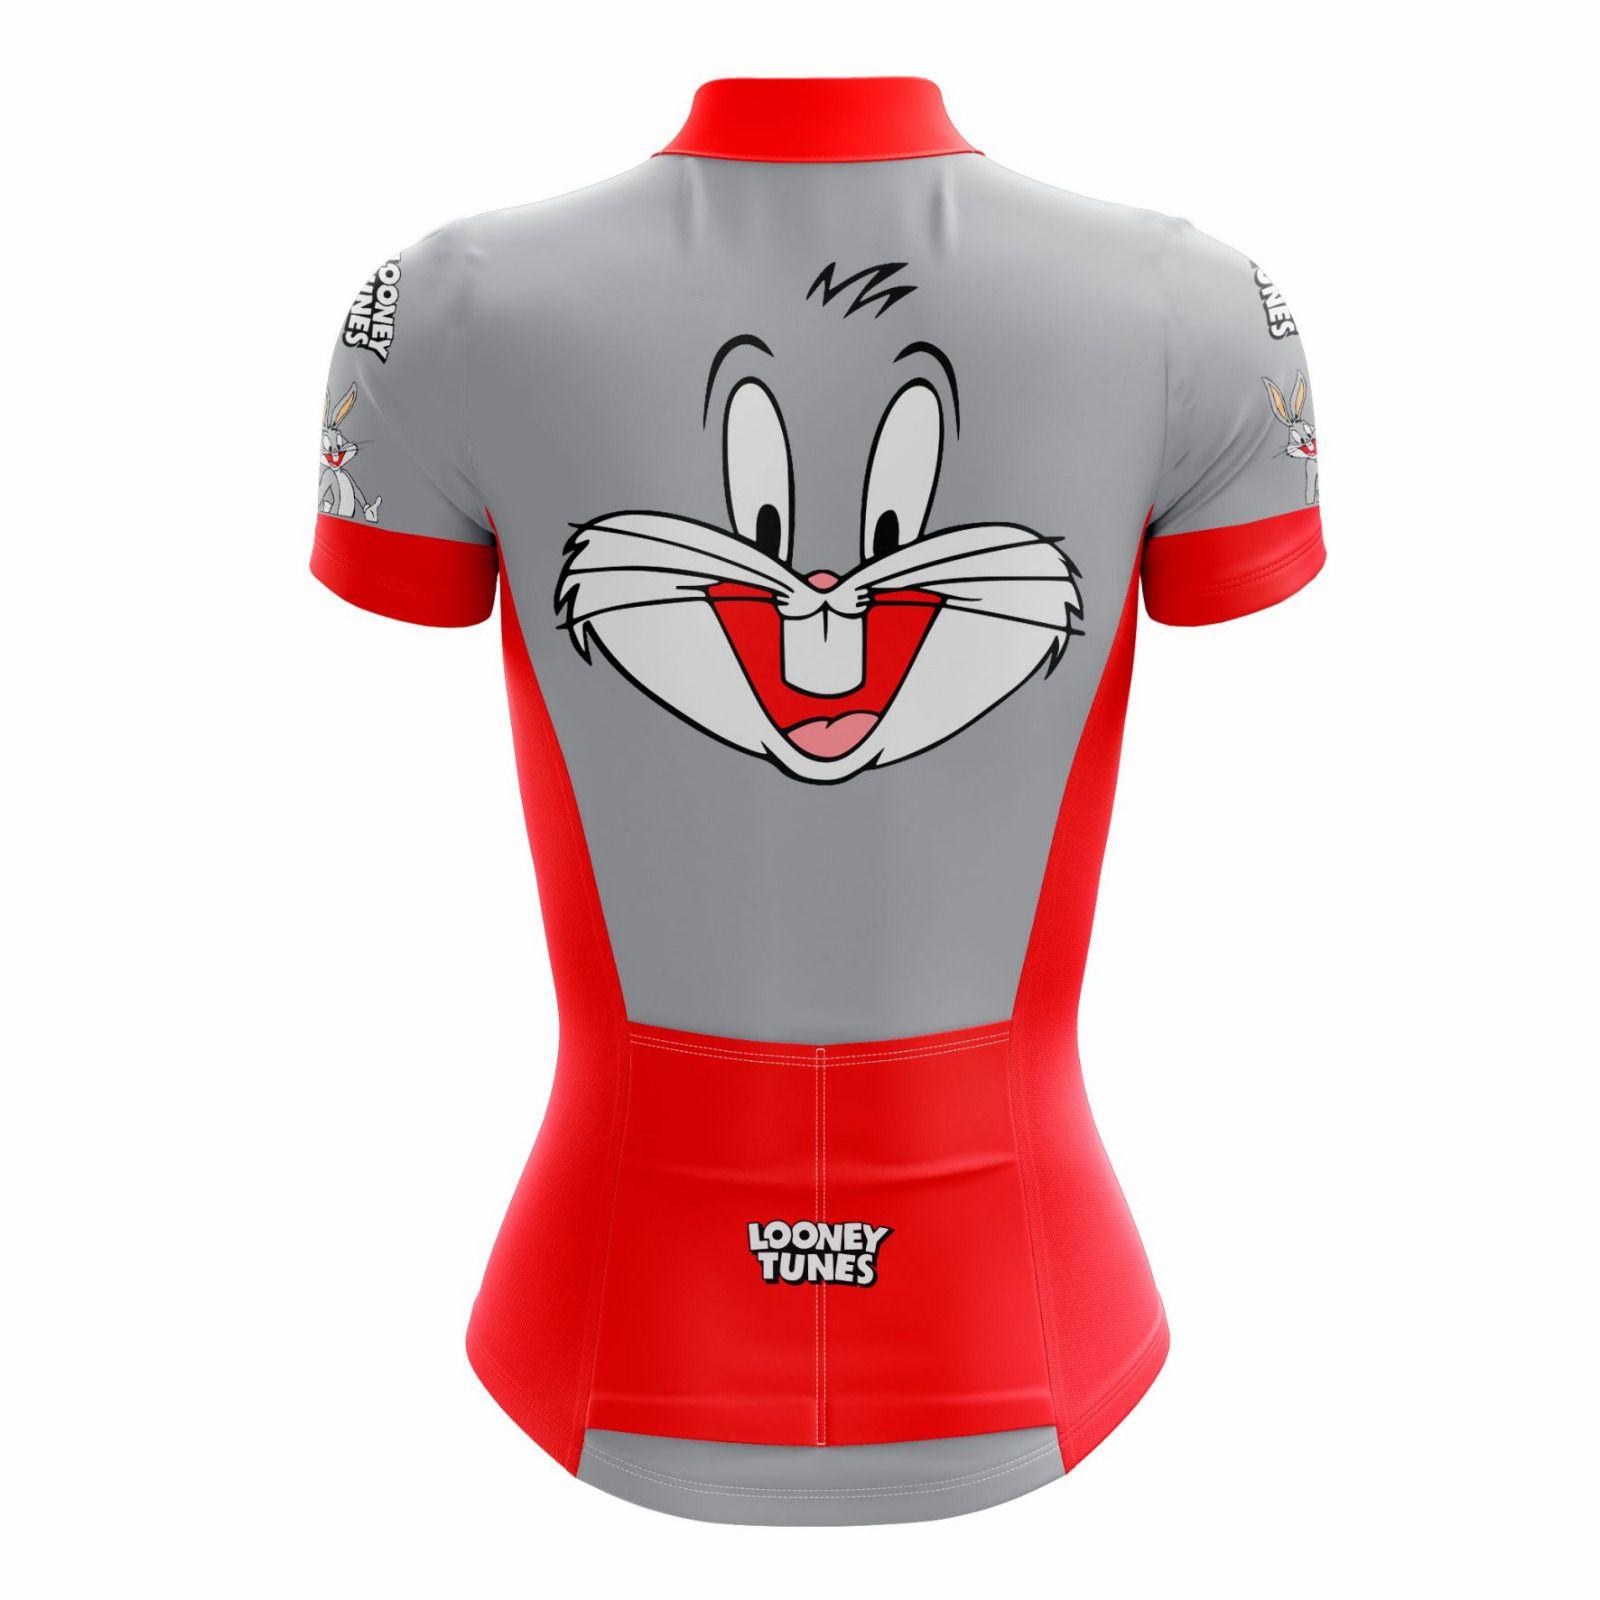 Camisa Ciclismo Feminina Looney Tunes Perna Longa - Scape